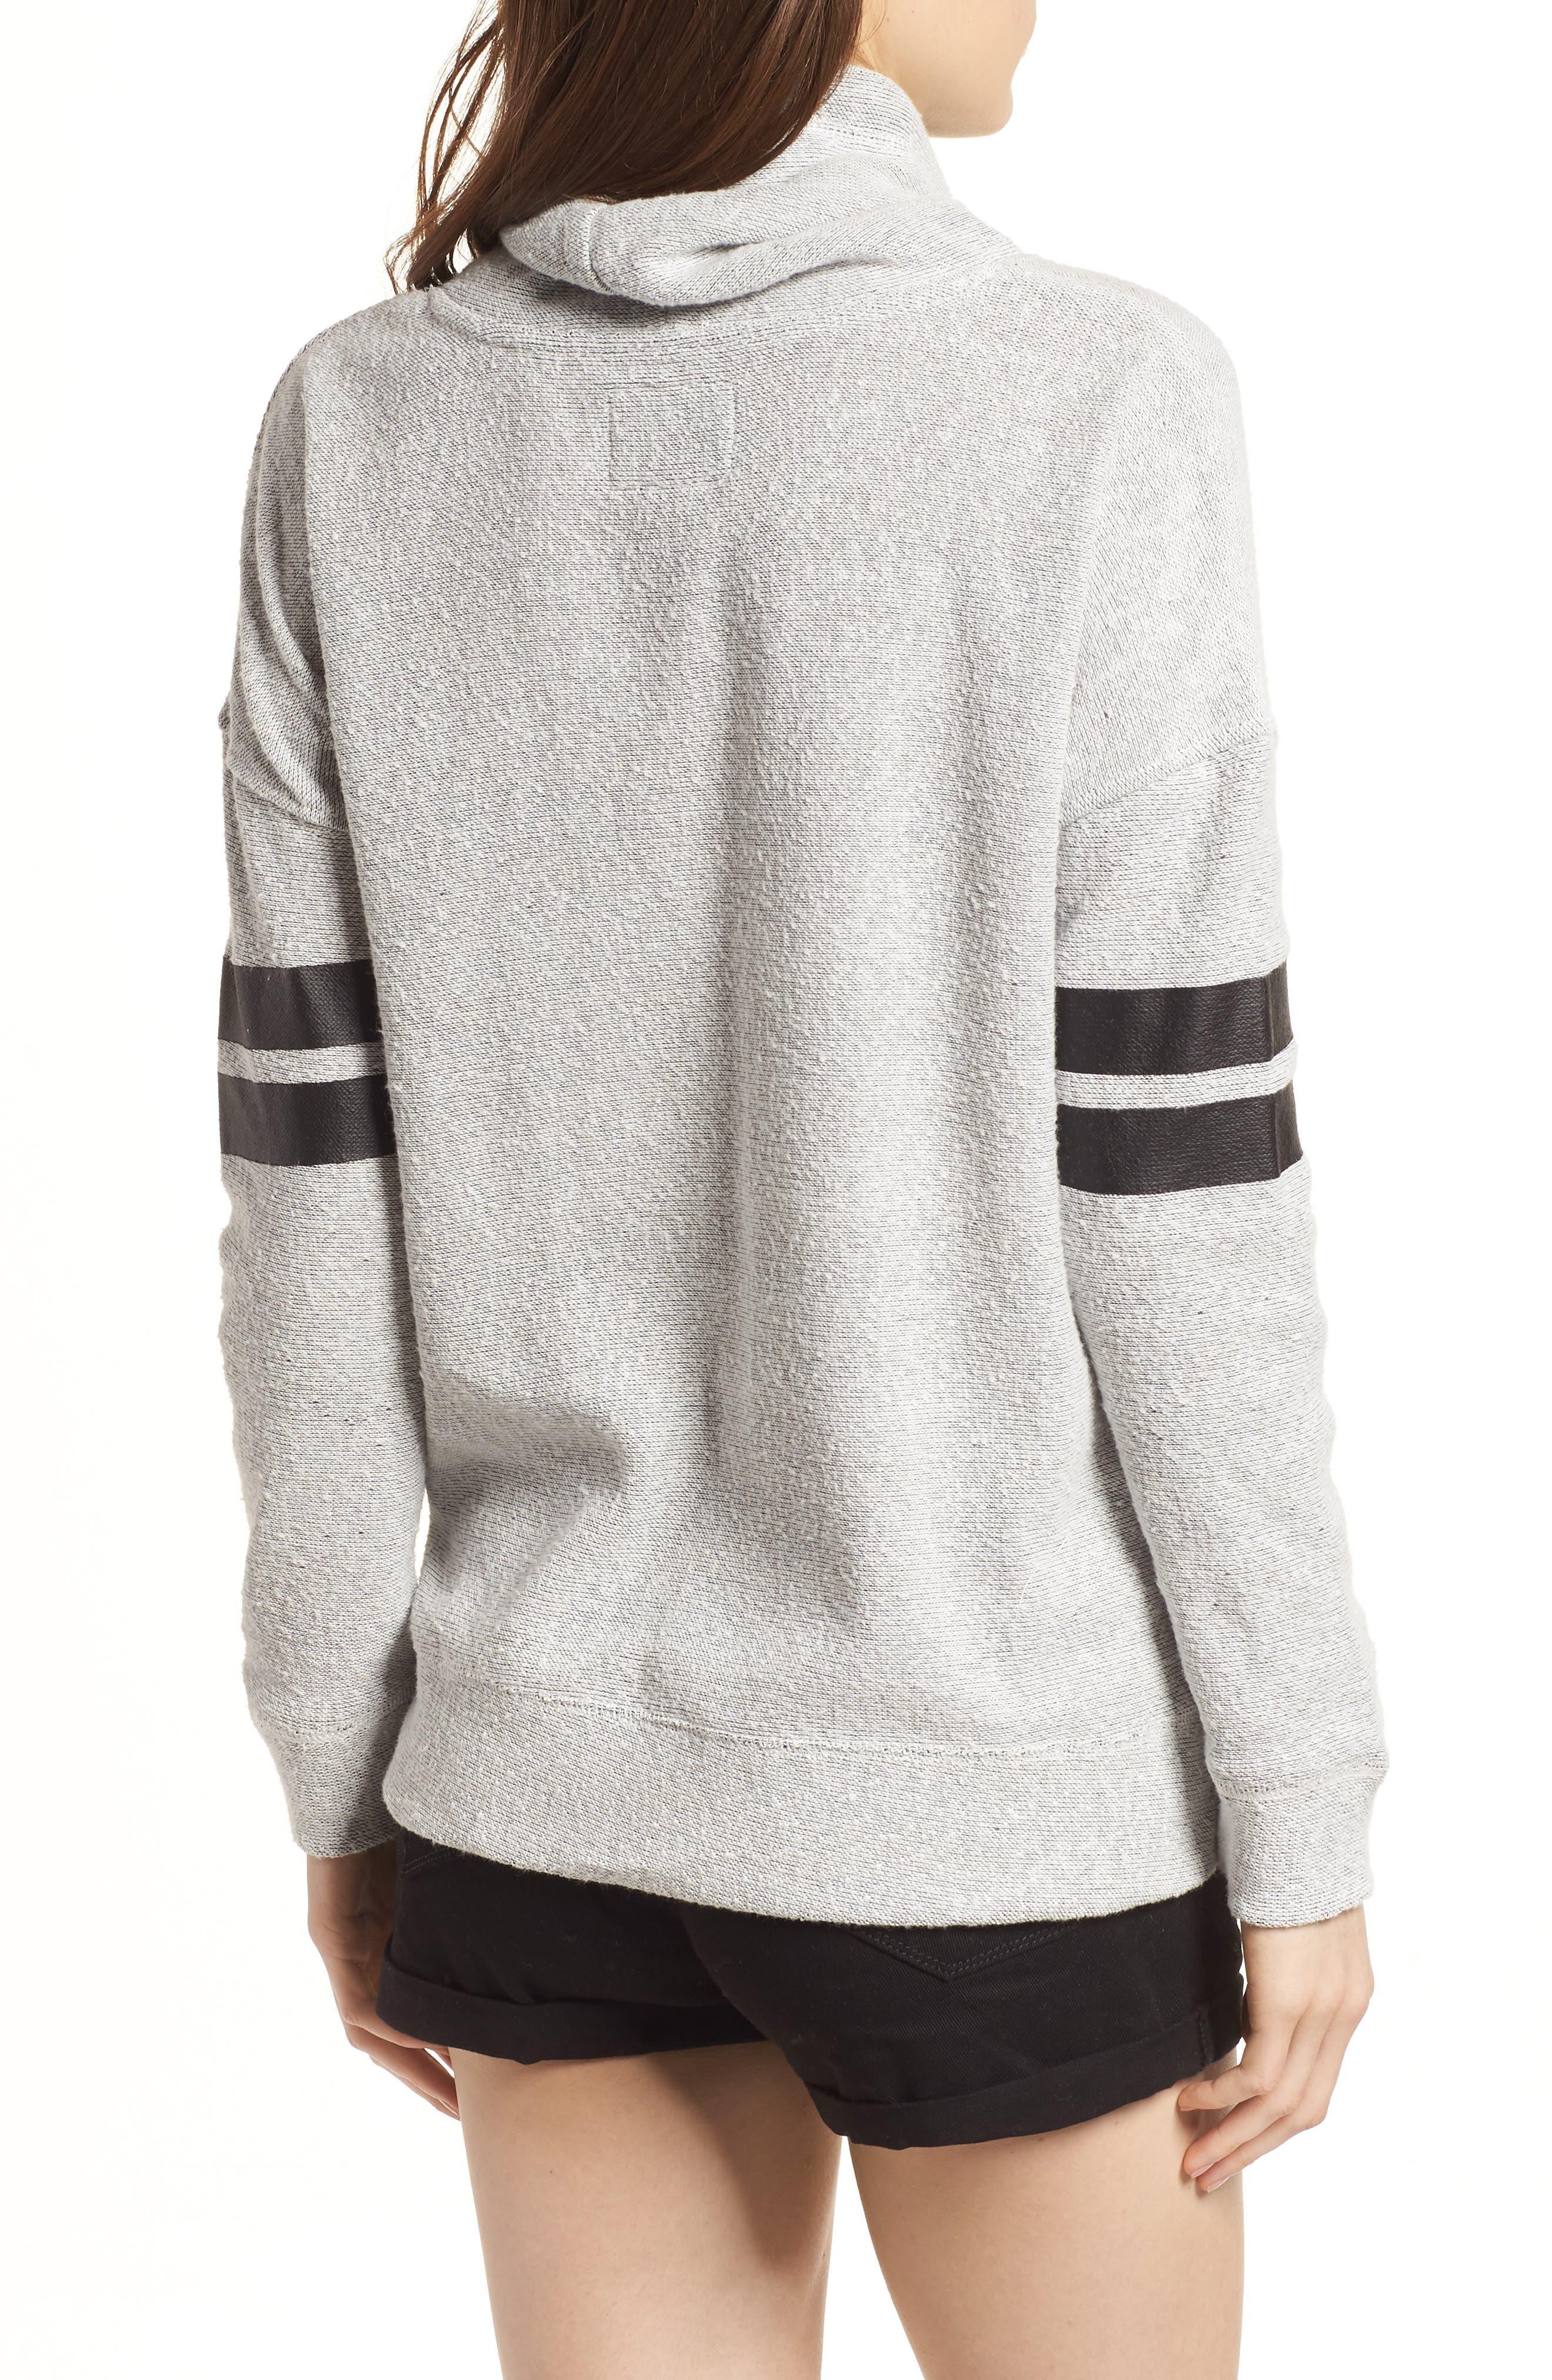 Offsides San Francisco Giants Funnel Neck Sweatshirt,                             Alternate thumbnail 2, color,                             Pumice Grey